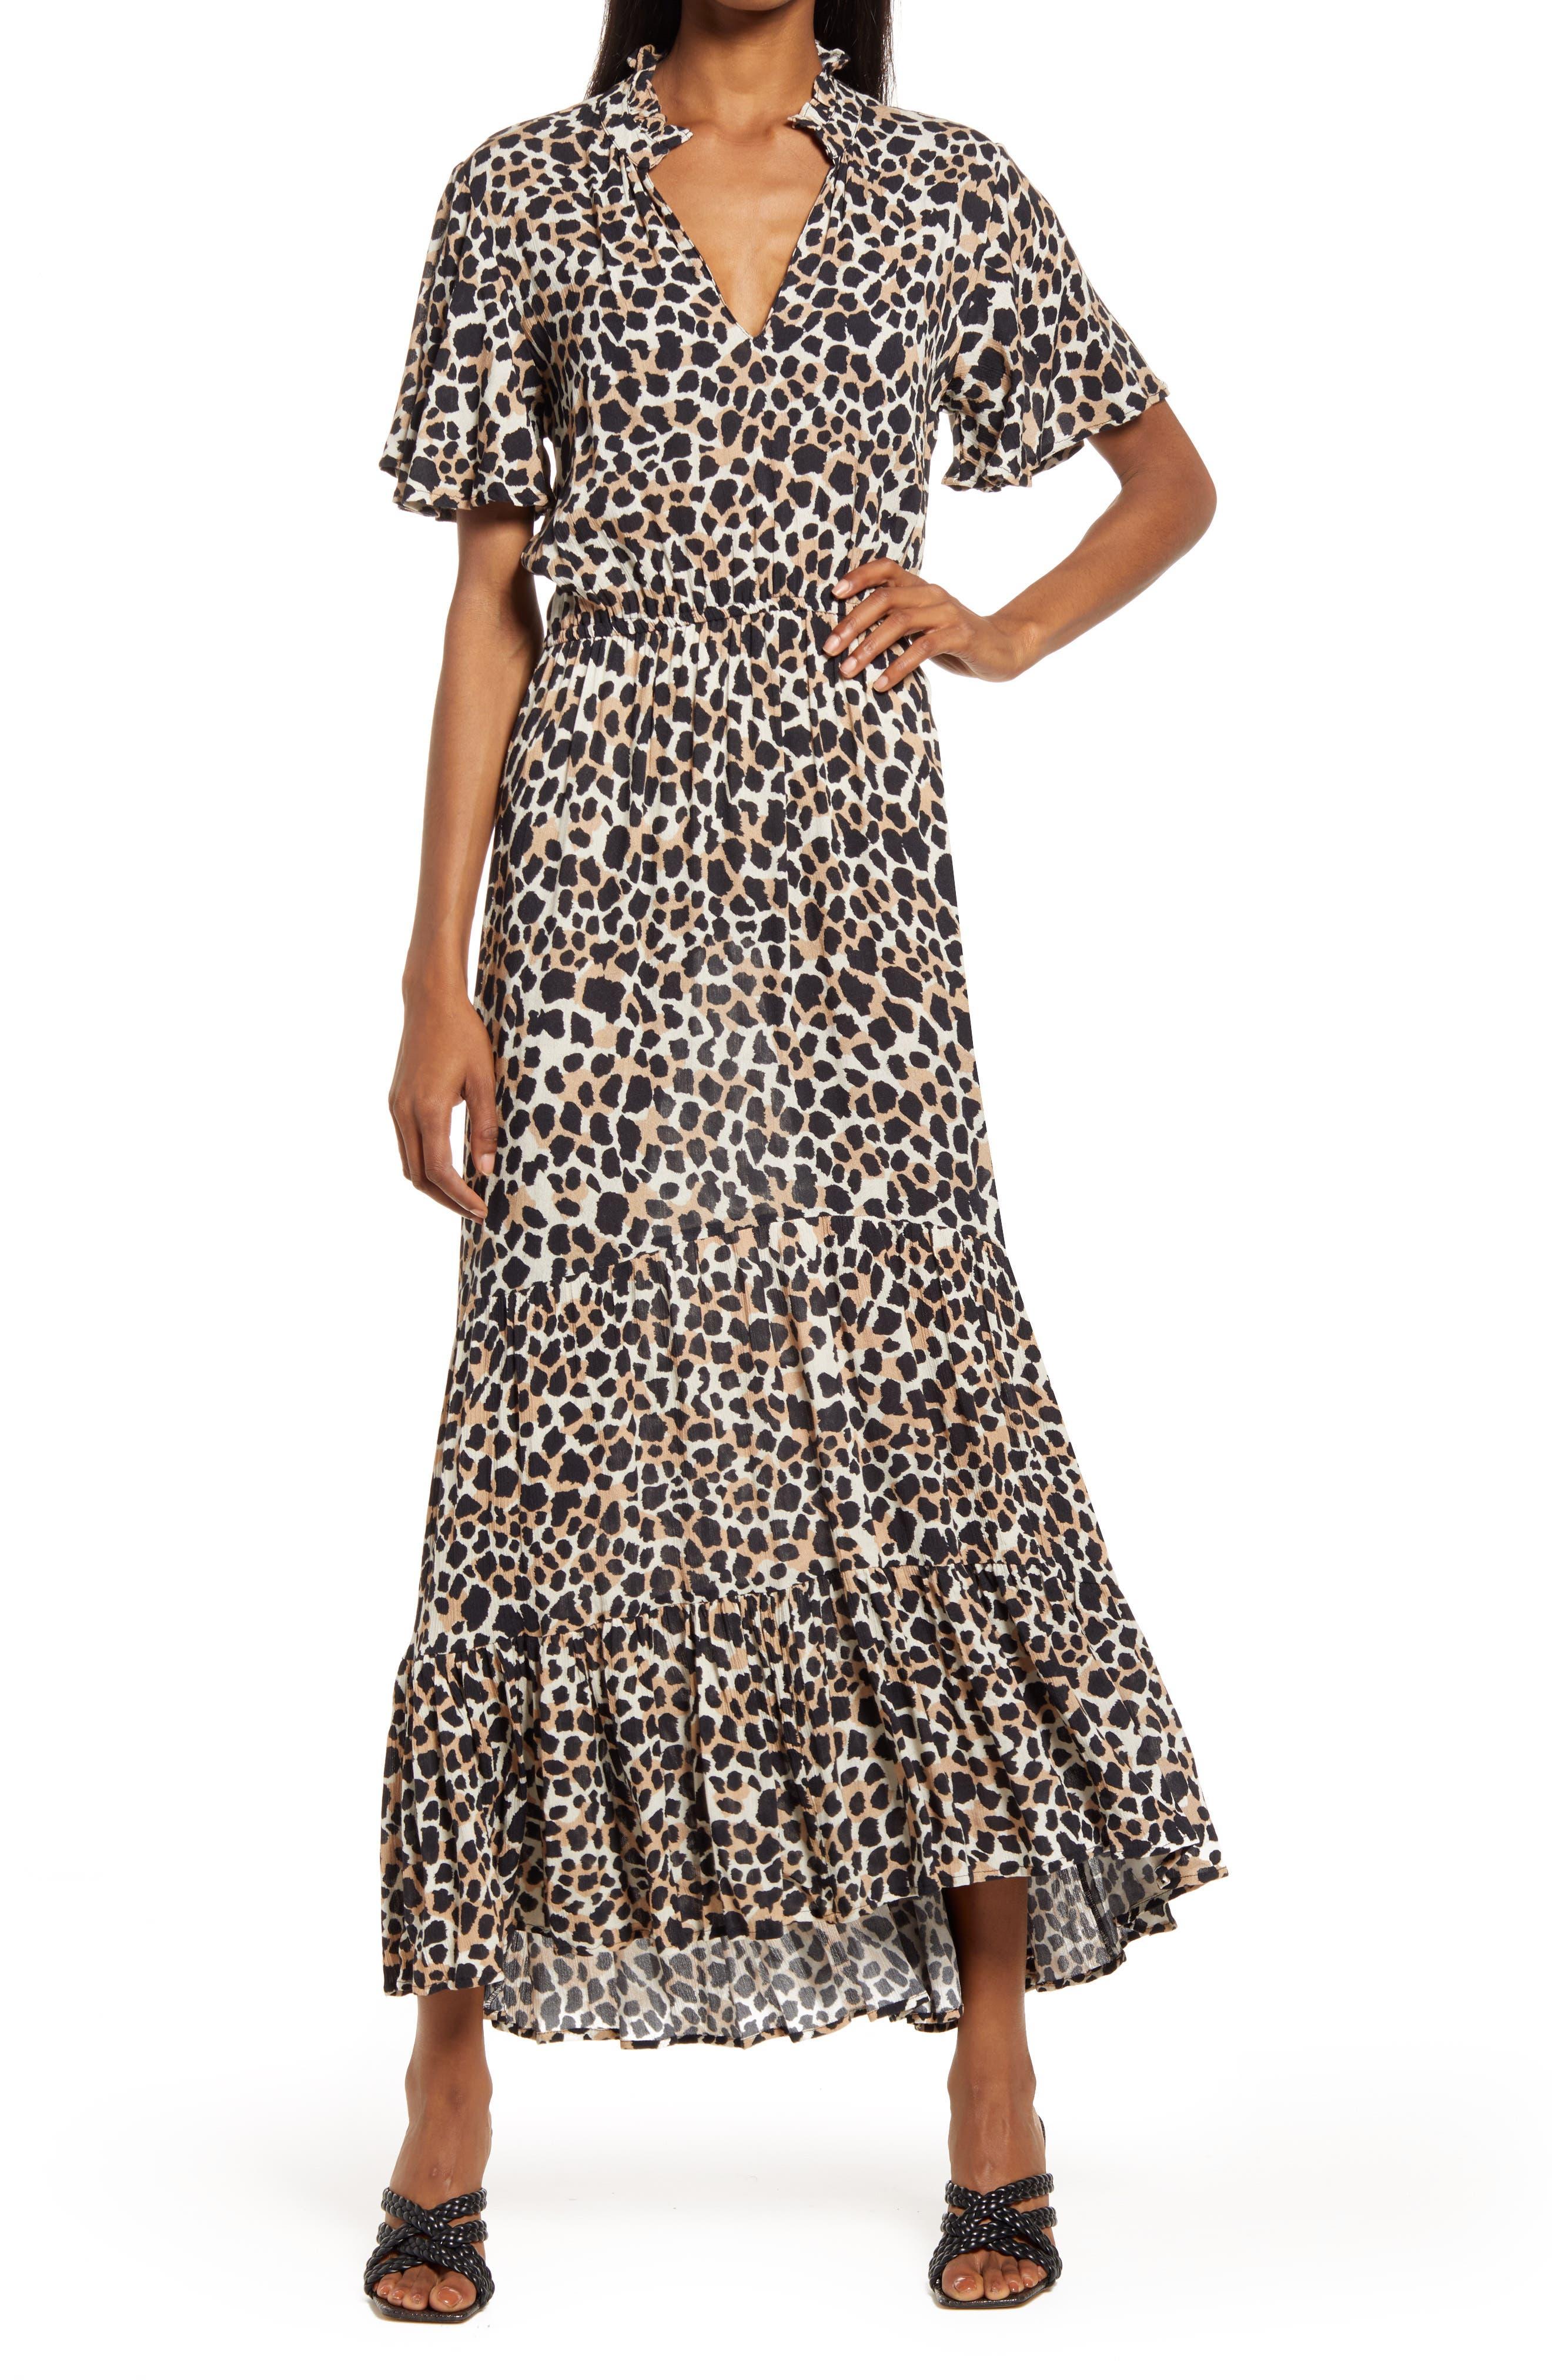 Lara Abstract Leopard Print Tiered Ruffle Maxi Dress